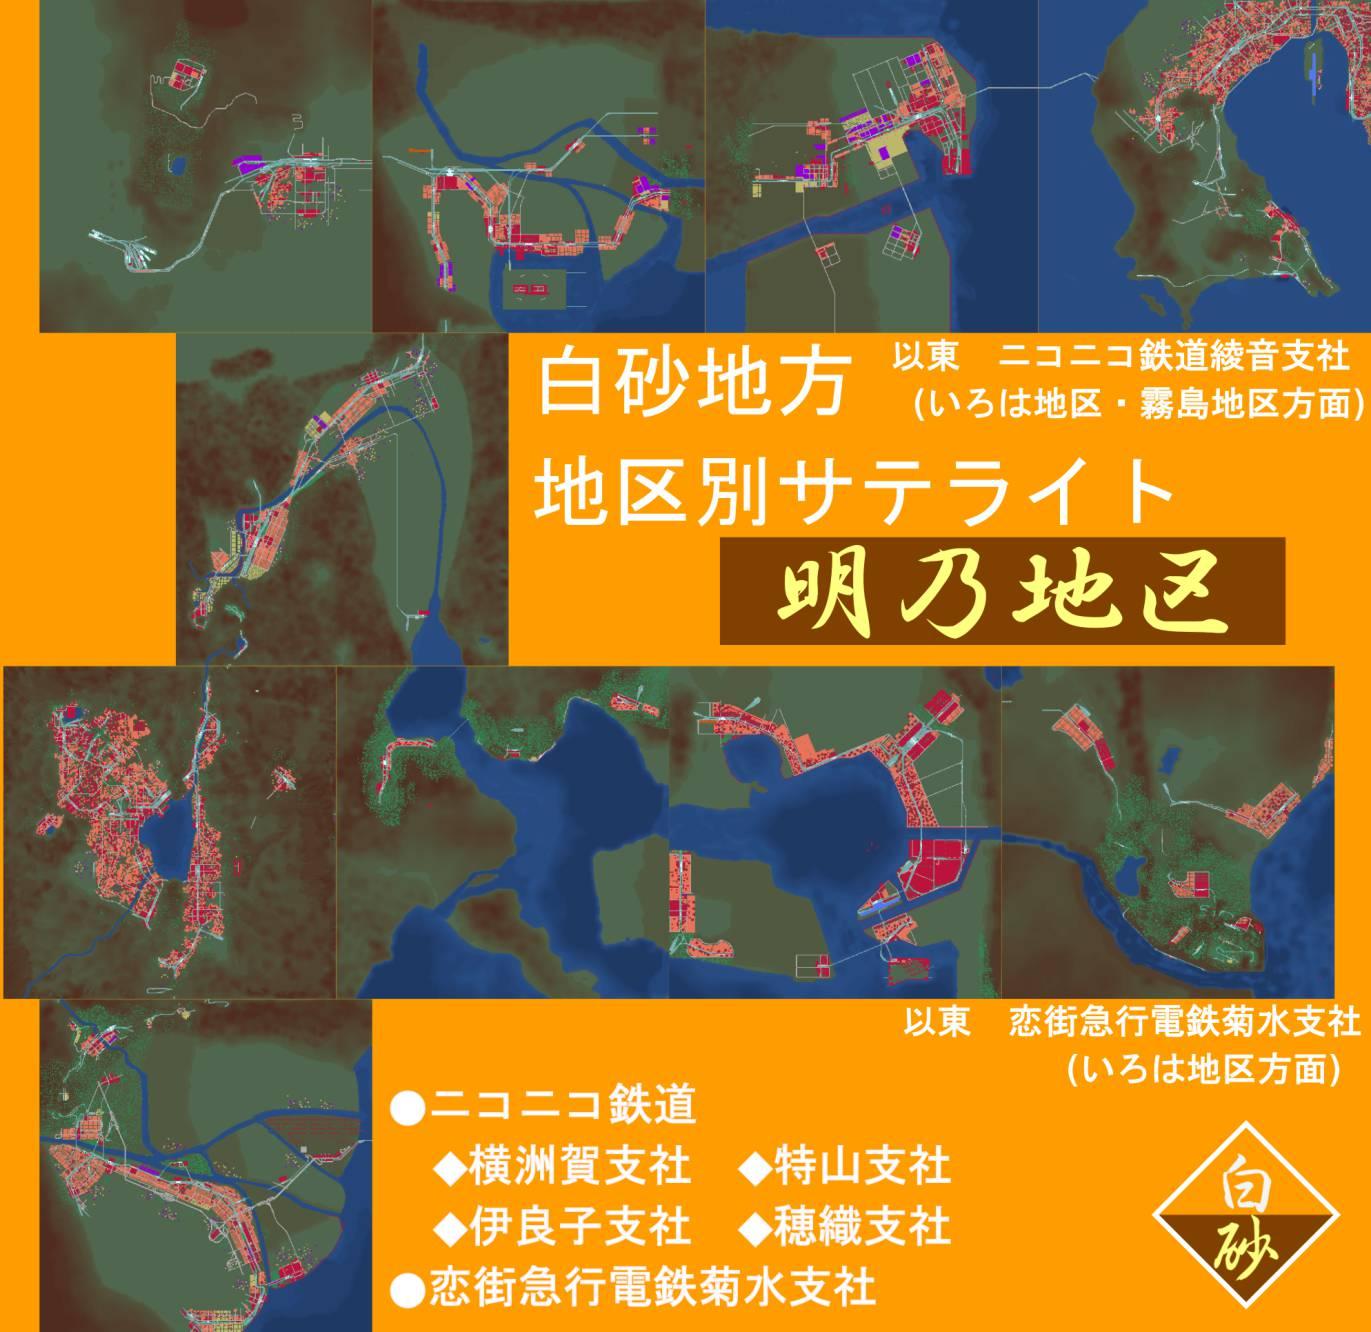 Akeno_2019_01_23_0800_compressed.jpg